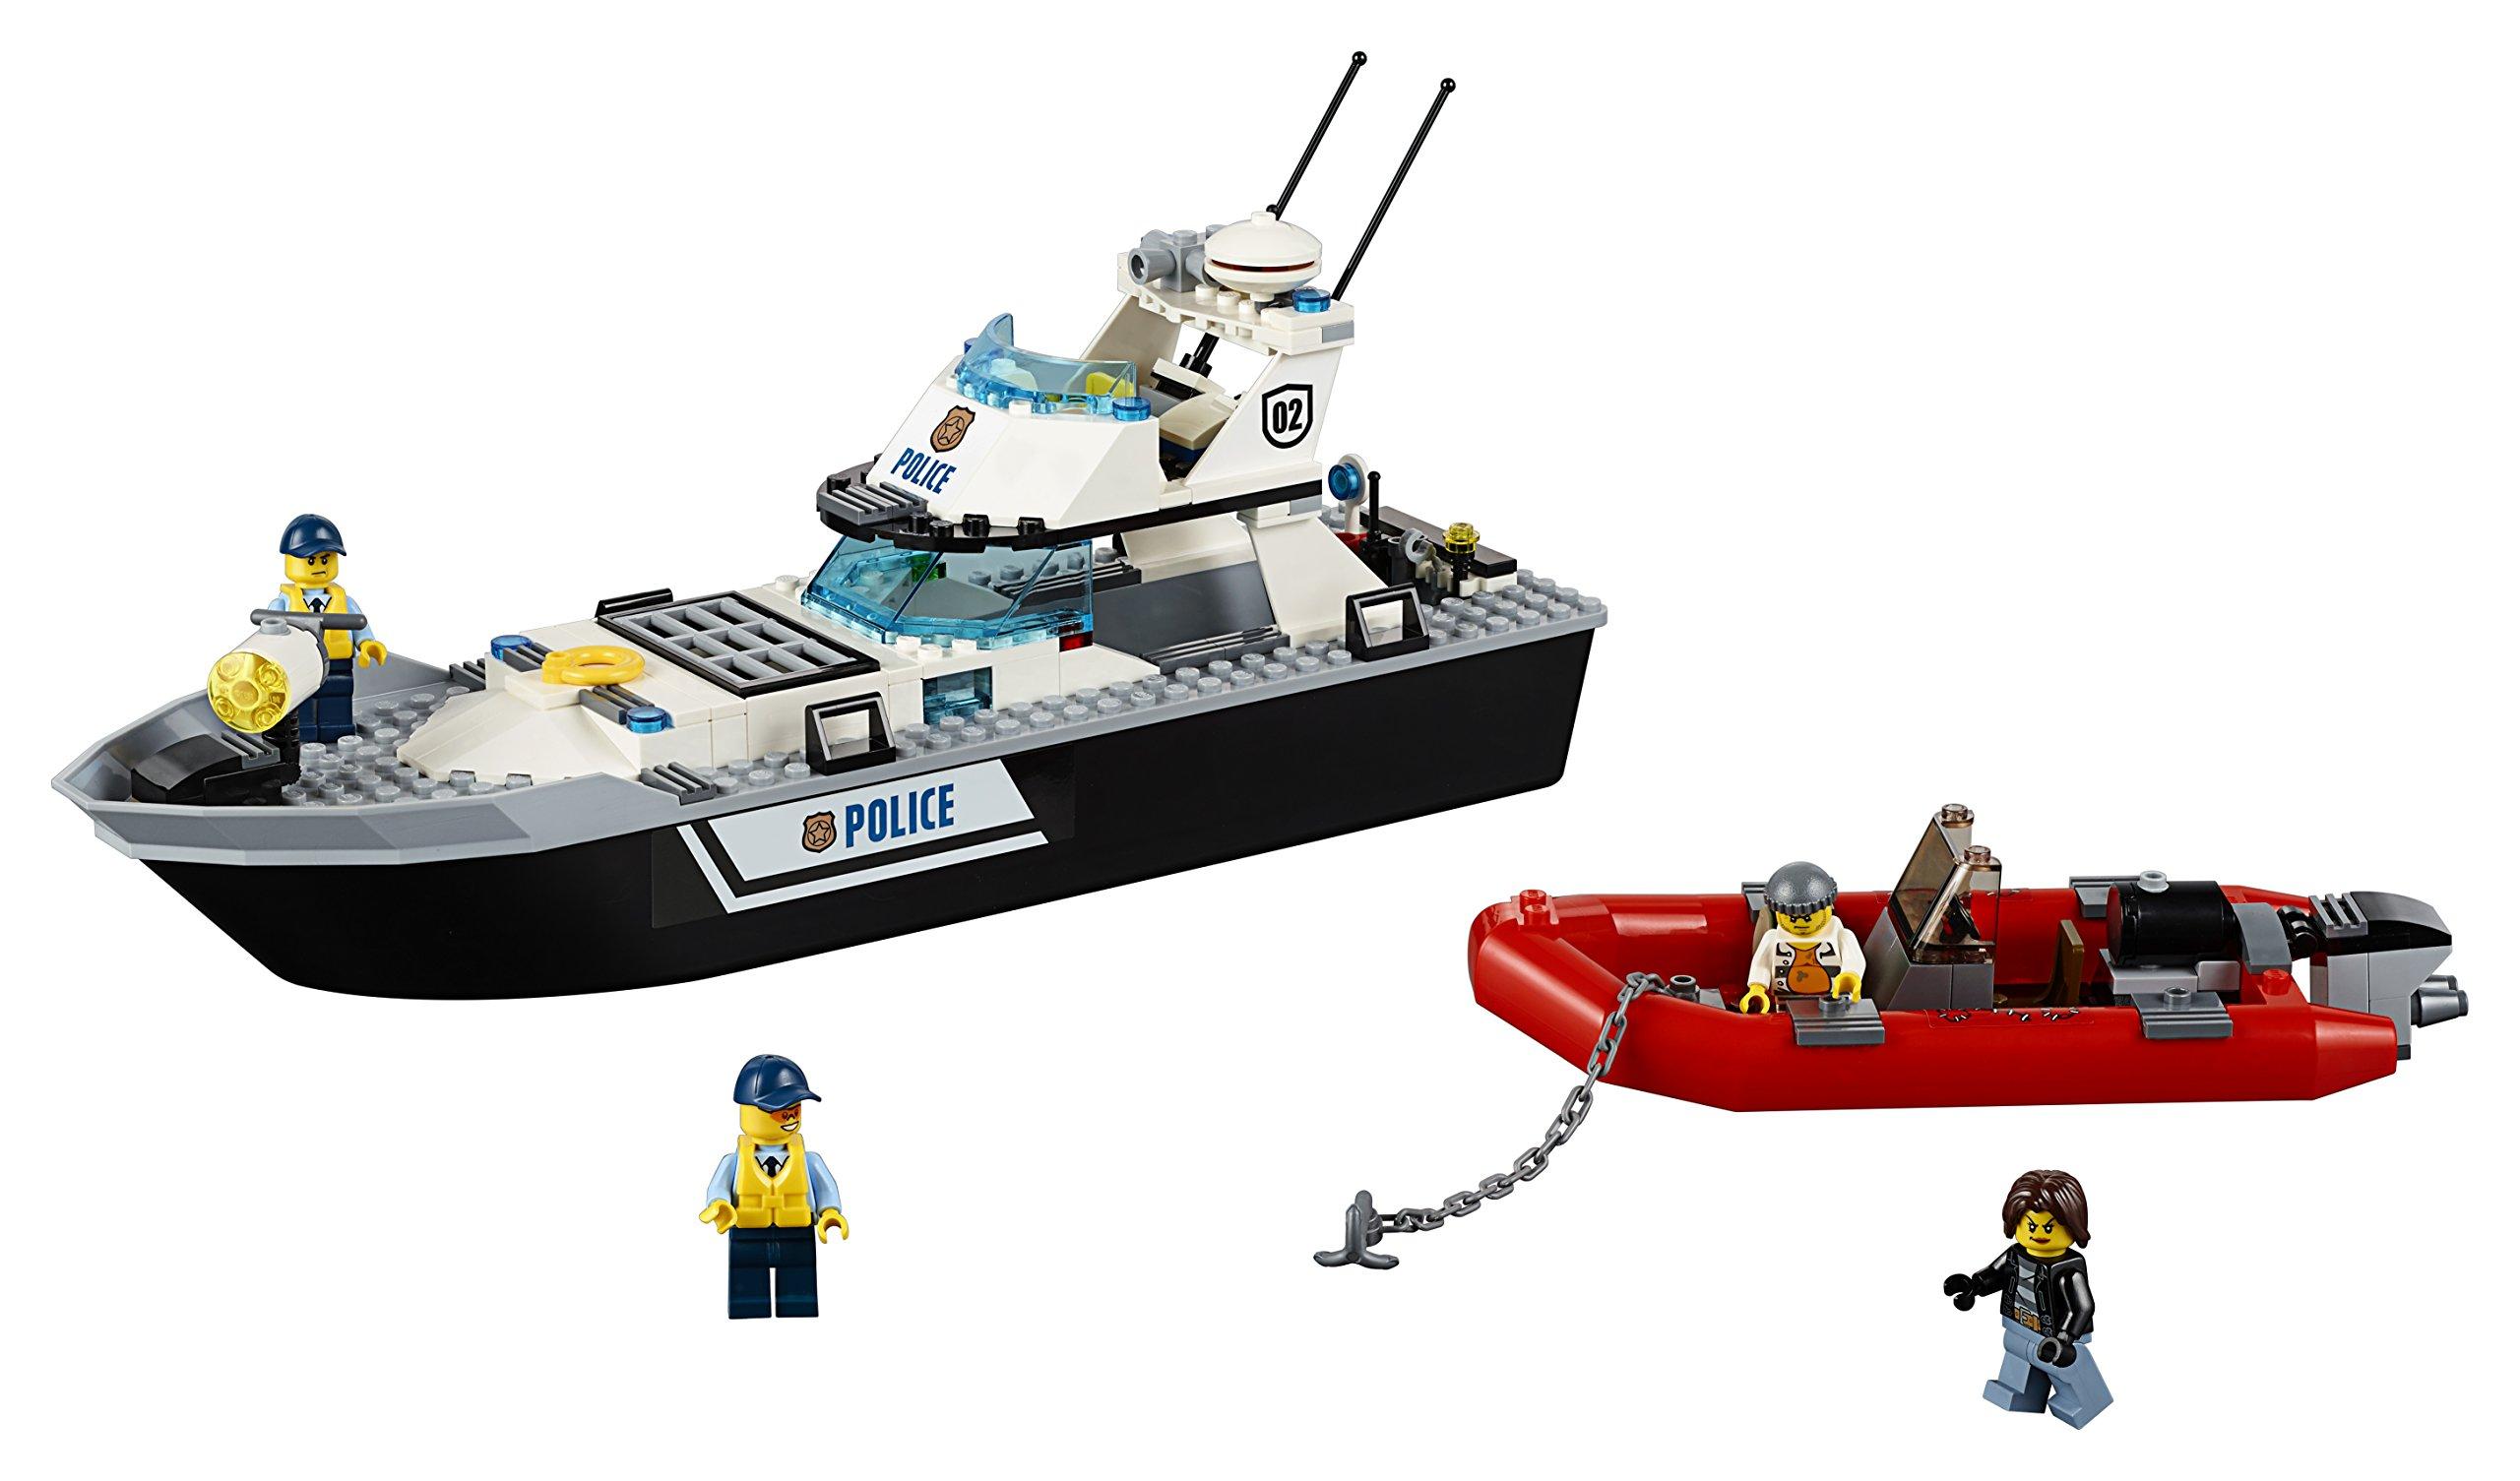 LEGO City Police Patrol Boat 60129 Building Toy | eBay